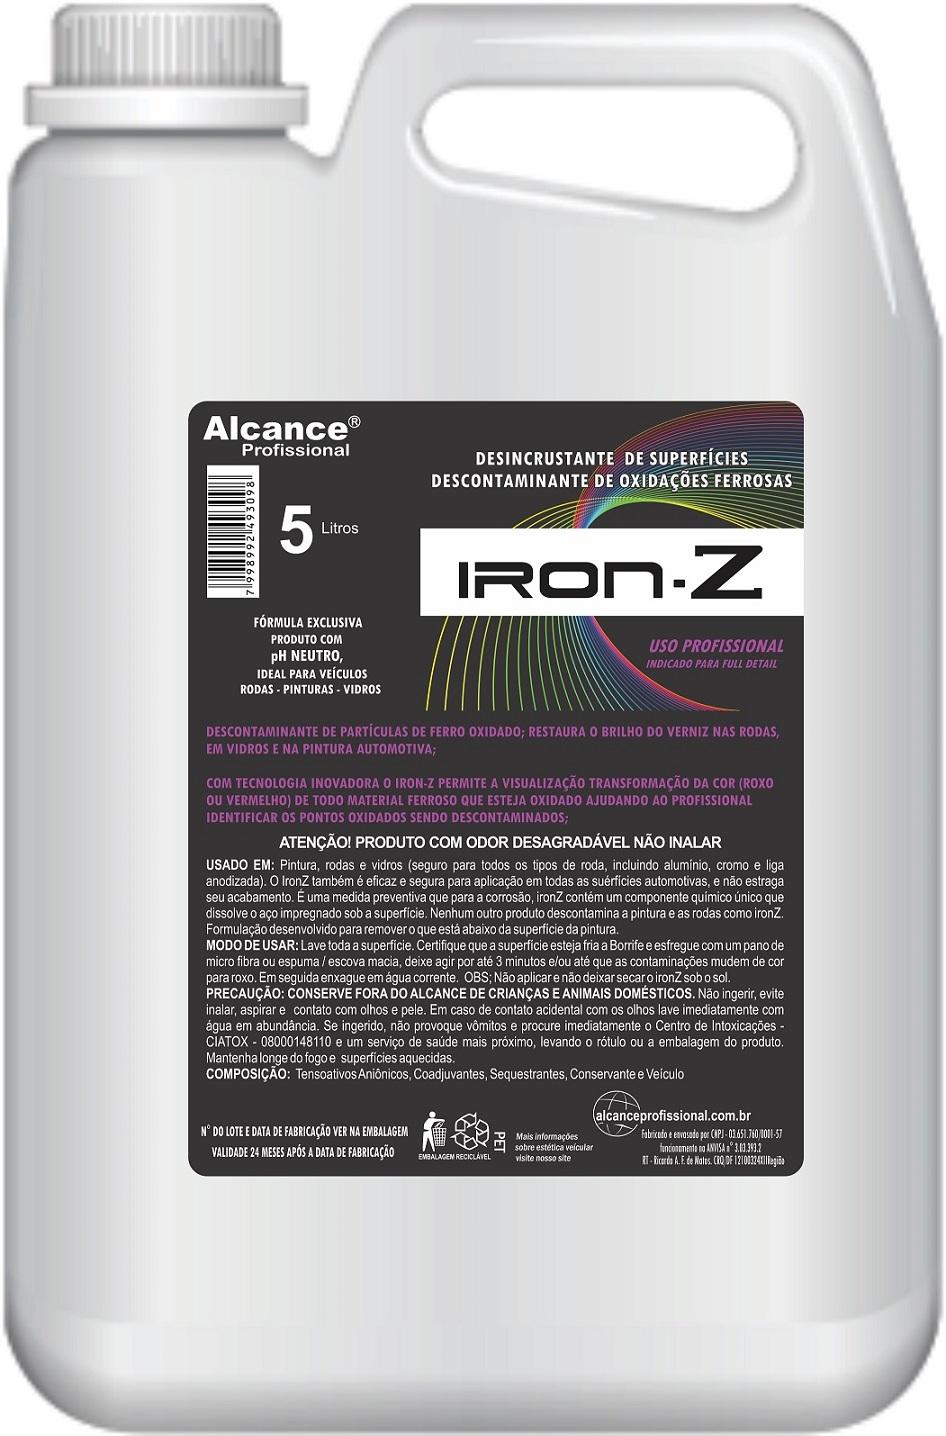 Iron-Z Descontaminante de Componente Ferroso 5lt Alcance Profissional